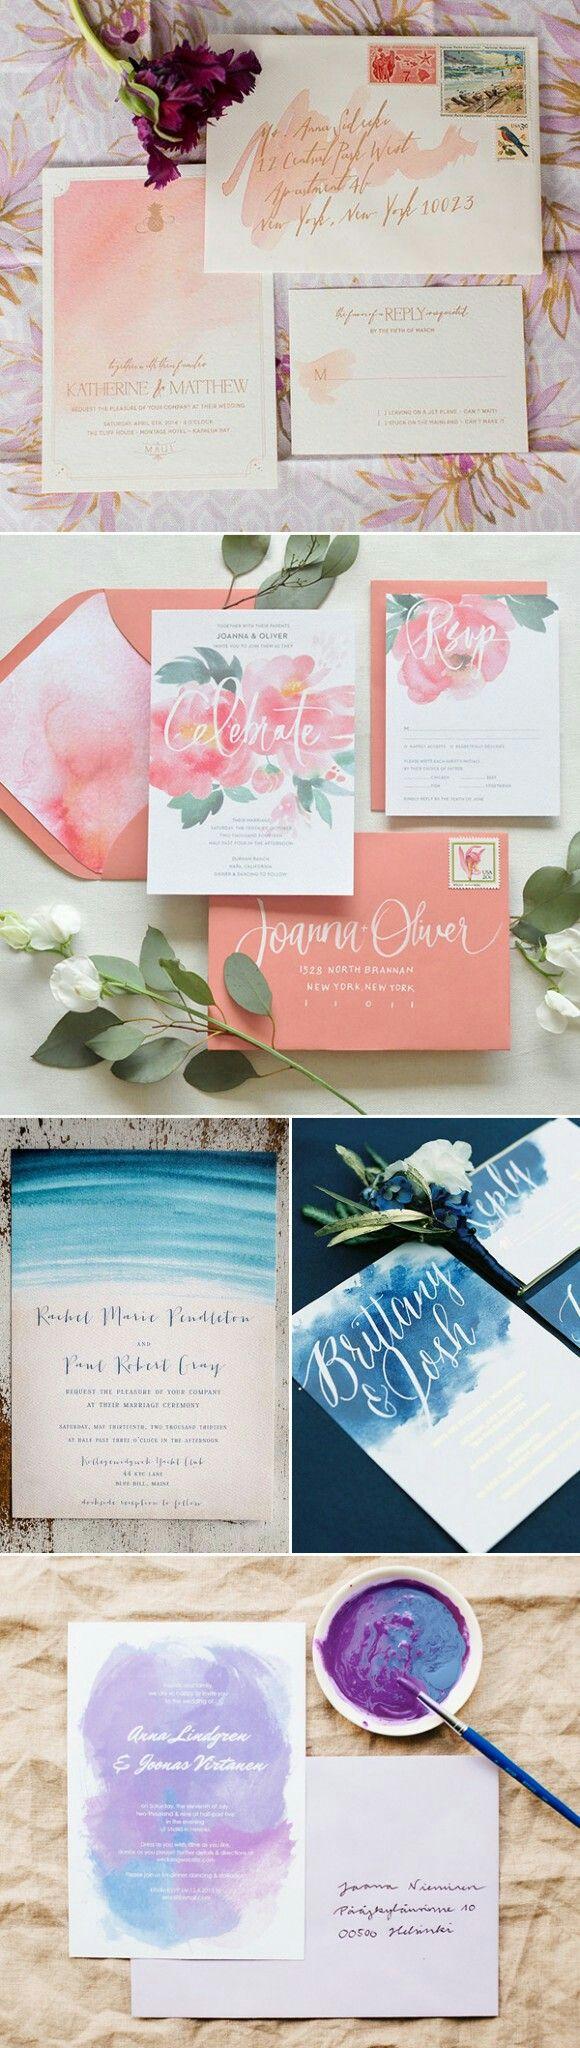 online wedding invitation free websites%0A    Creative Invitation Ideas for Minimalist Couples